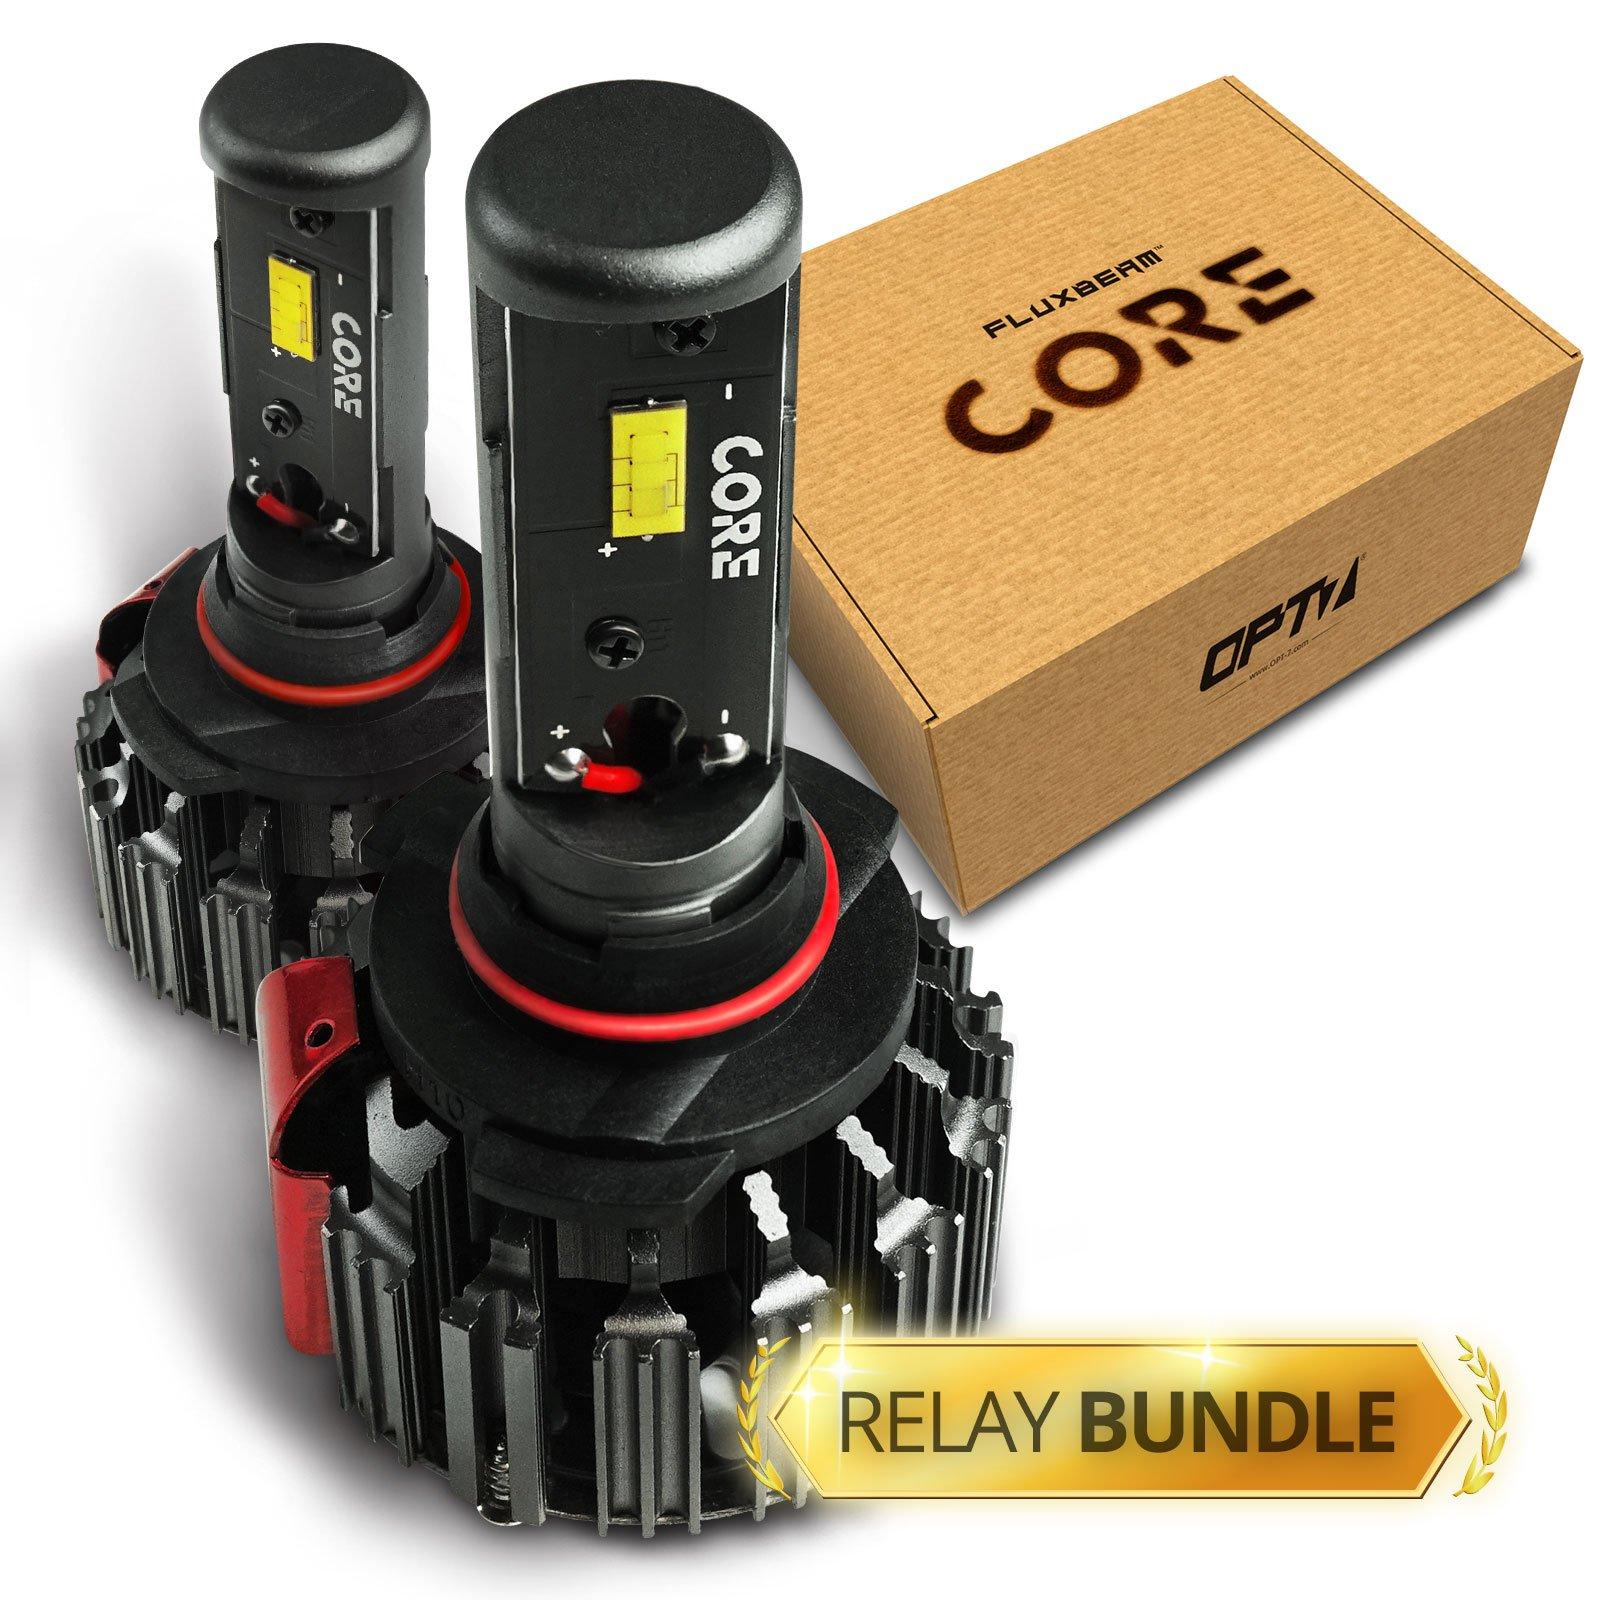 OPT7 FluxBeam CORE 9006 LED Headlight Kit Bulbs w/Relay Bundle - 60w 6,000LM 6K Cool White CREE - 1 Year Warranty